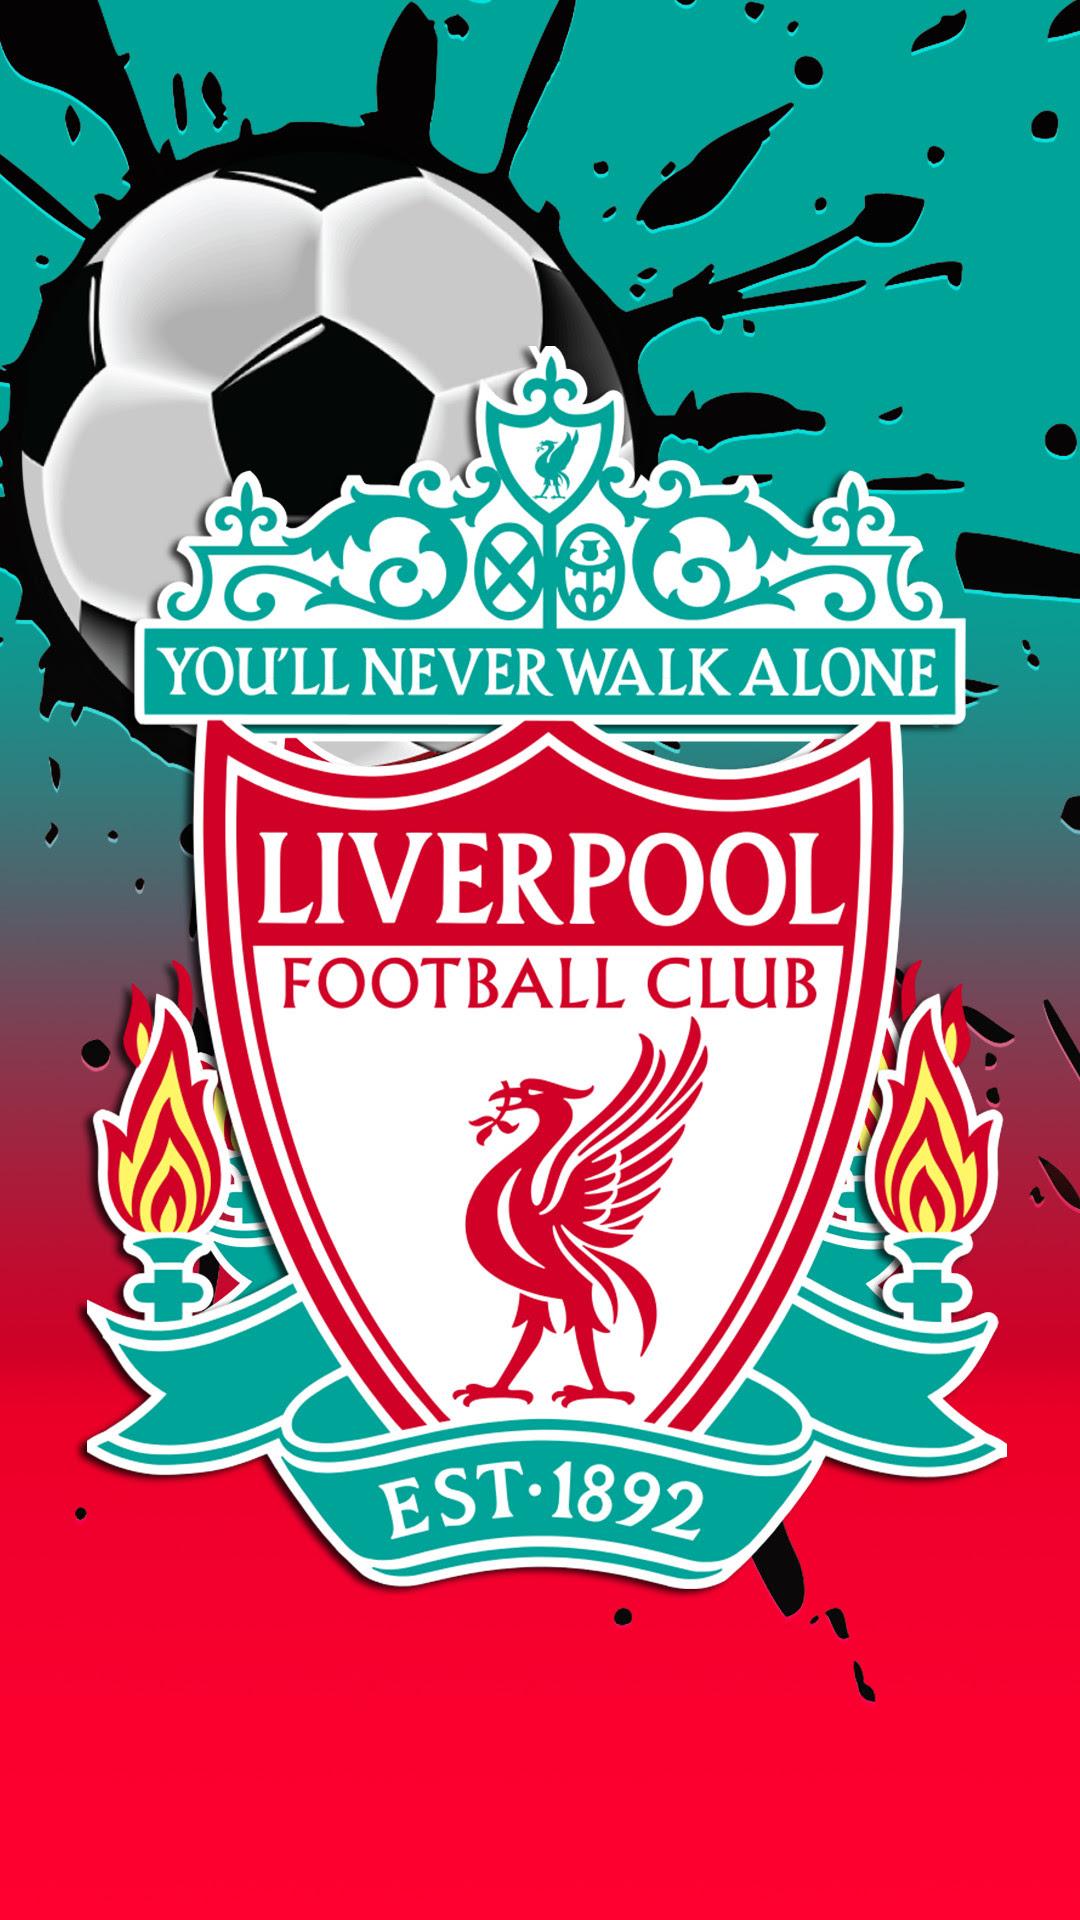 Liverpool Fc Desktop Wallpaper 1920X1080 : Manchester United Wallpaper 2018 ·① WallpaperTag ...